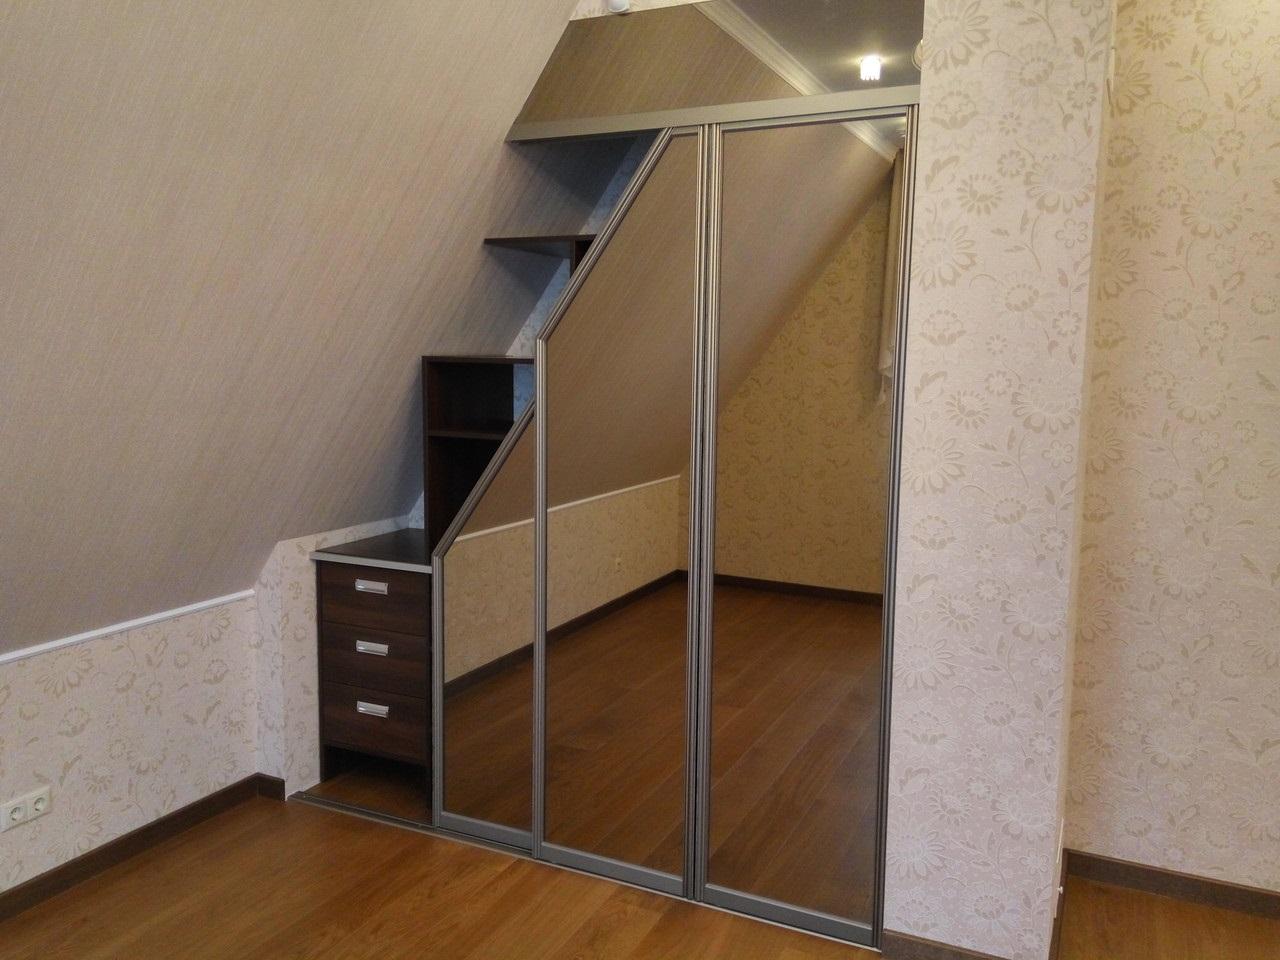 монорельсовая система шкафа